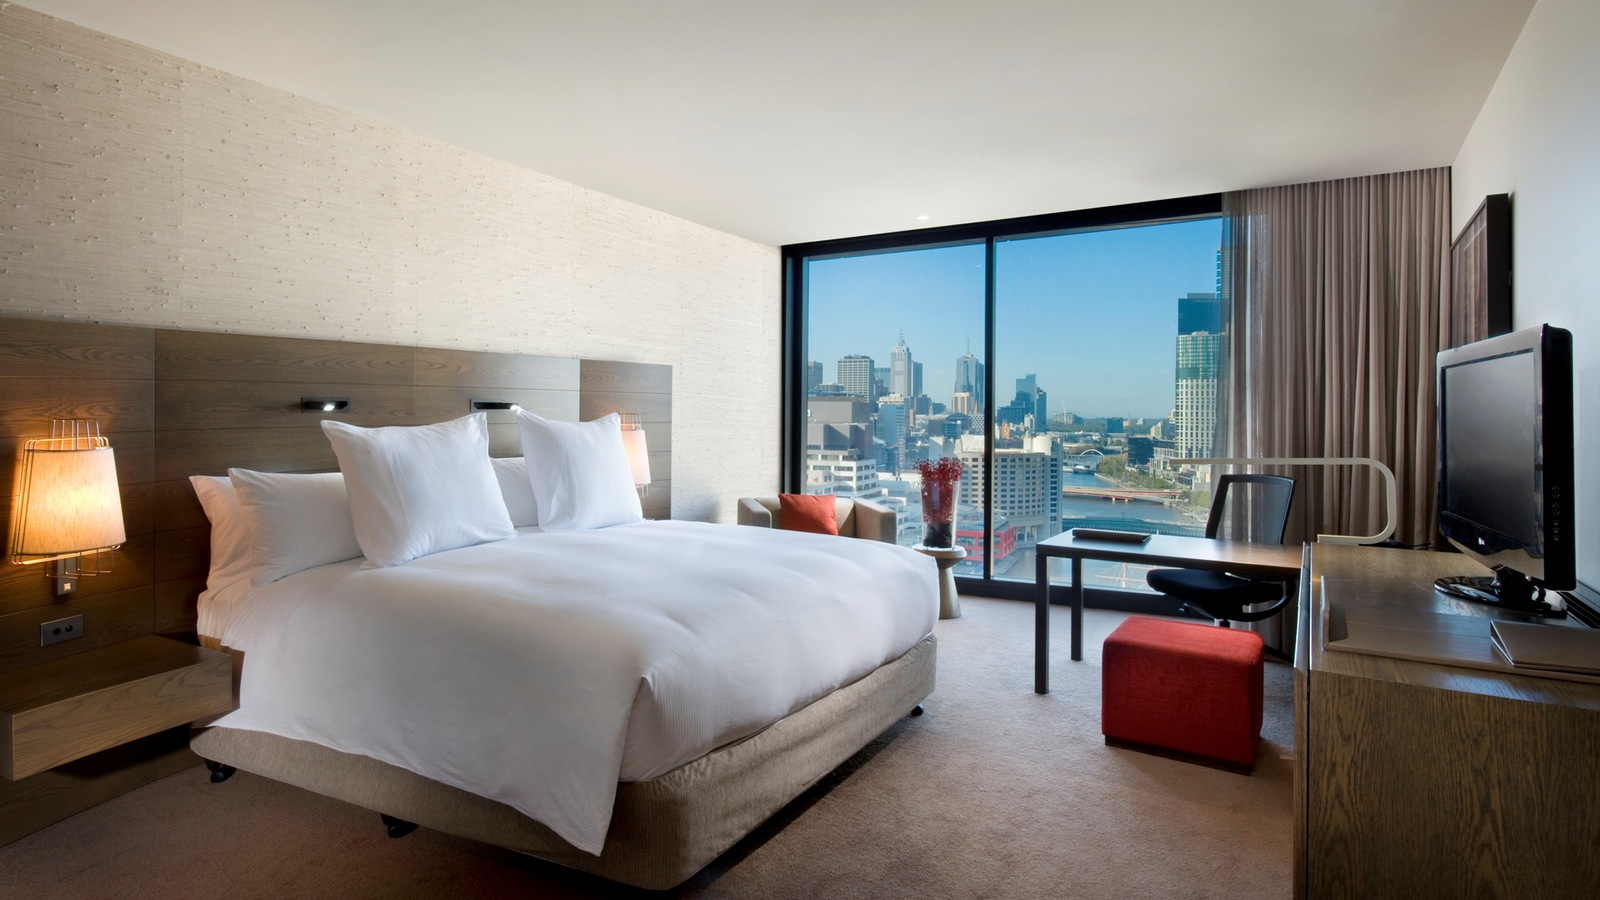 Hilton Melbourne South Wharf - King City View Room